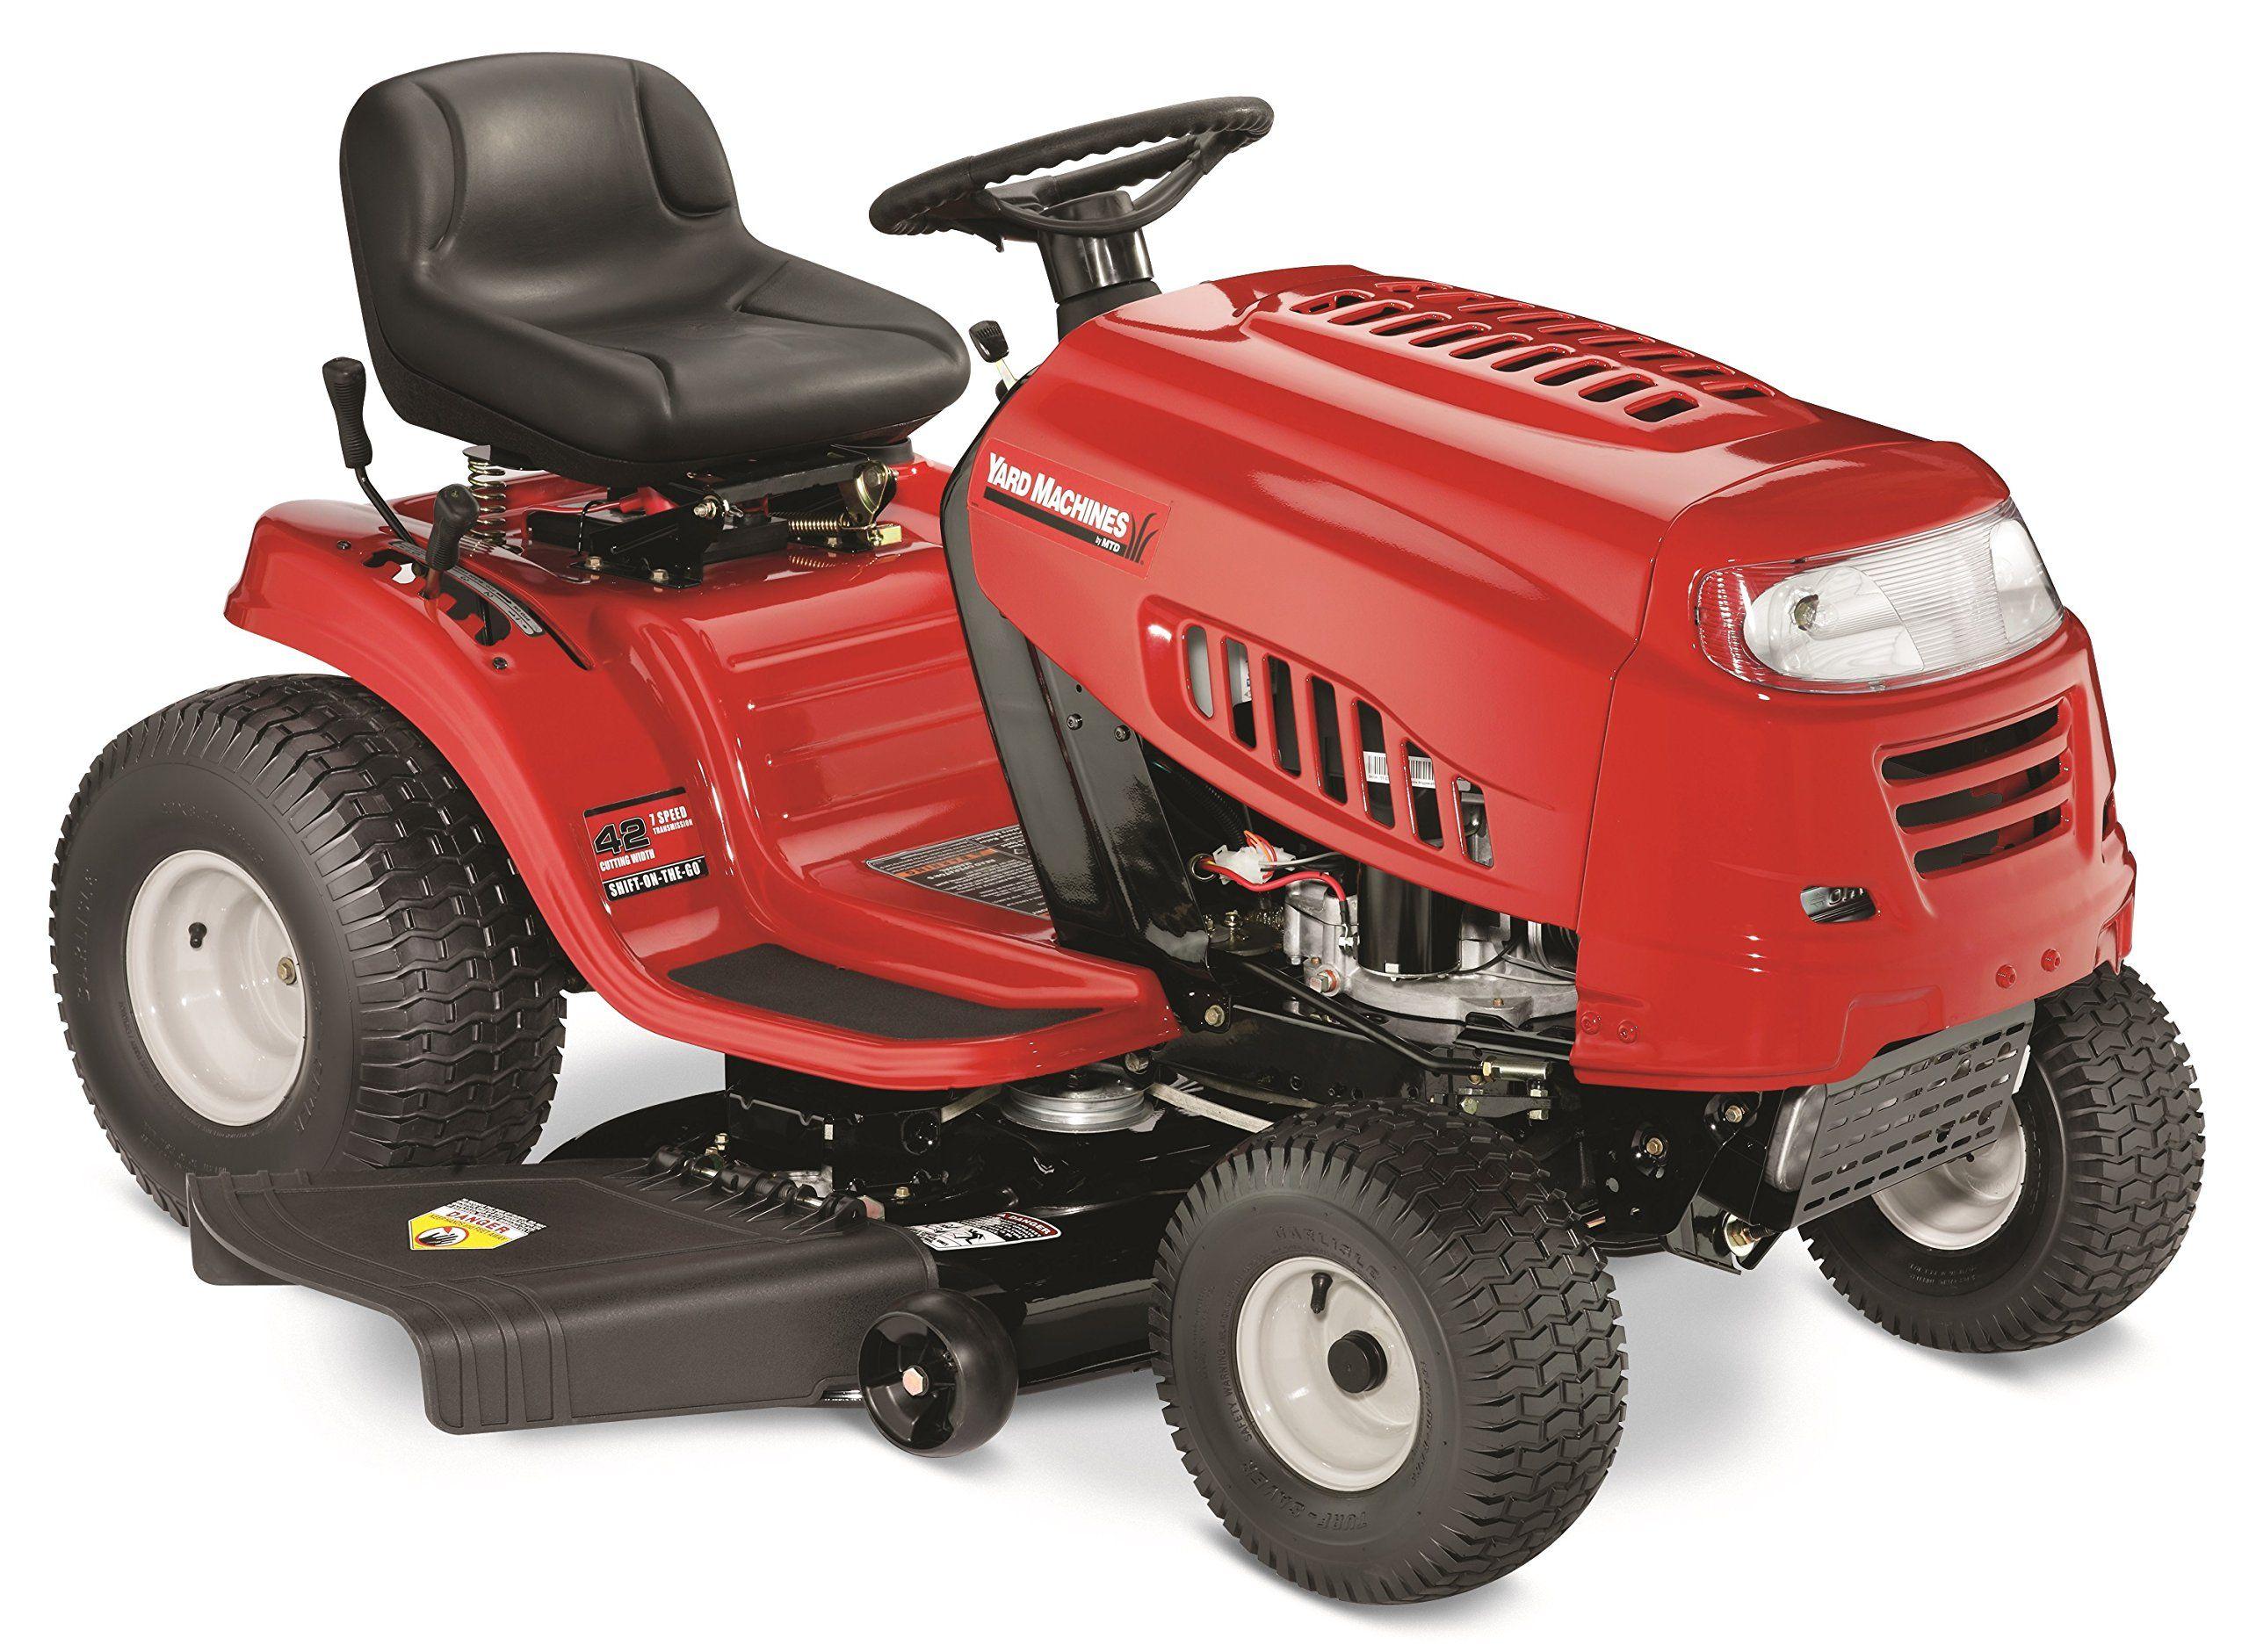 Best Riding Lawn Mowers Riding Lawn Mowers Best Riding Lawn Mower Lawn Mower Tractor